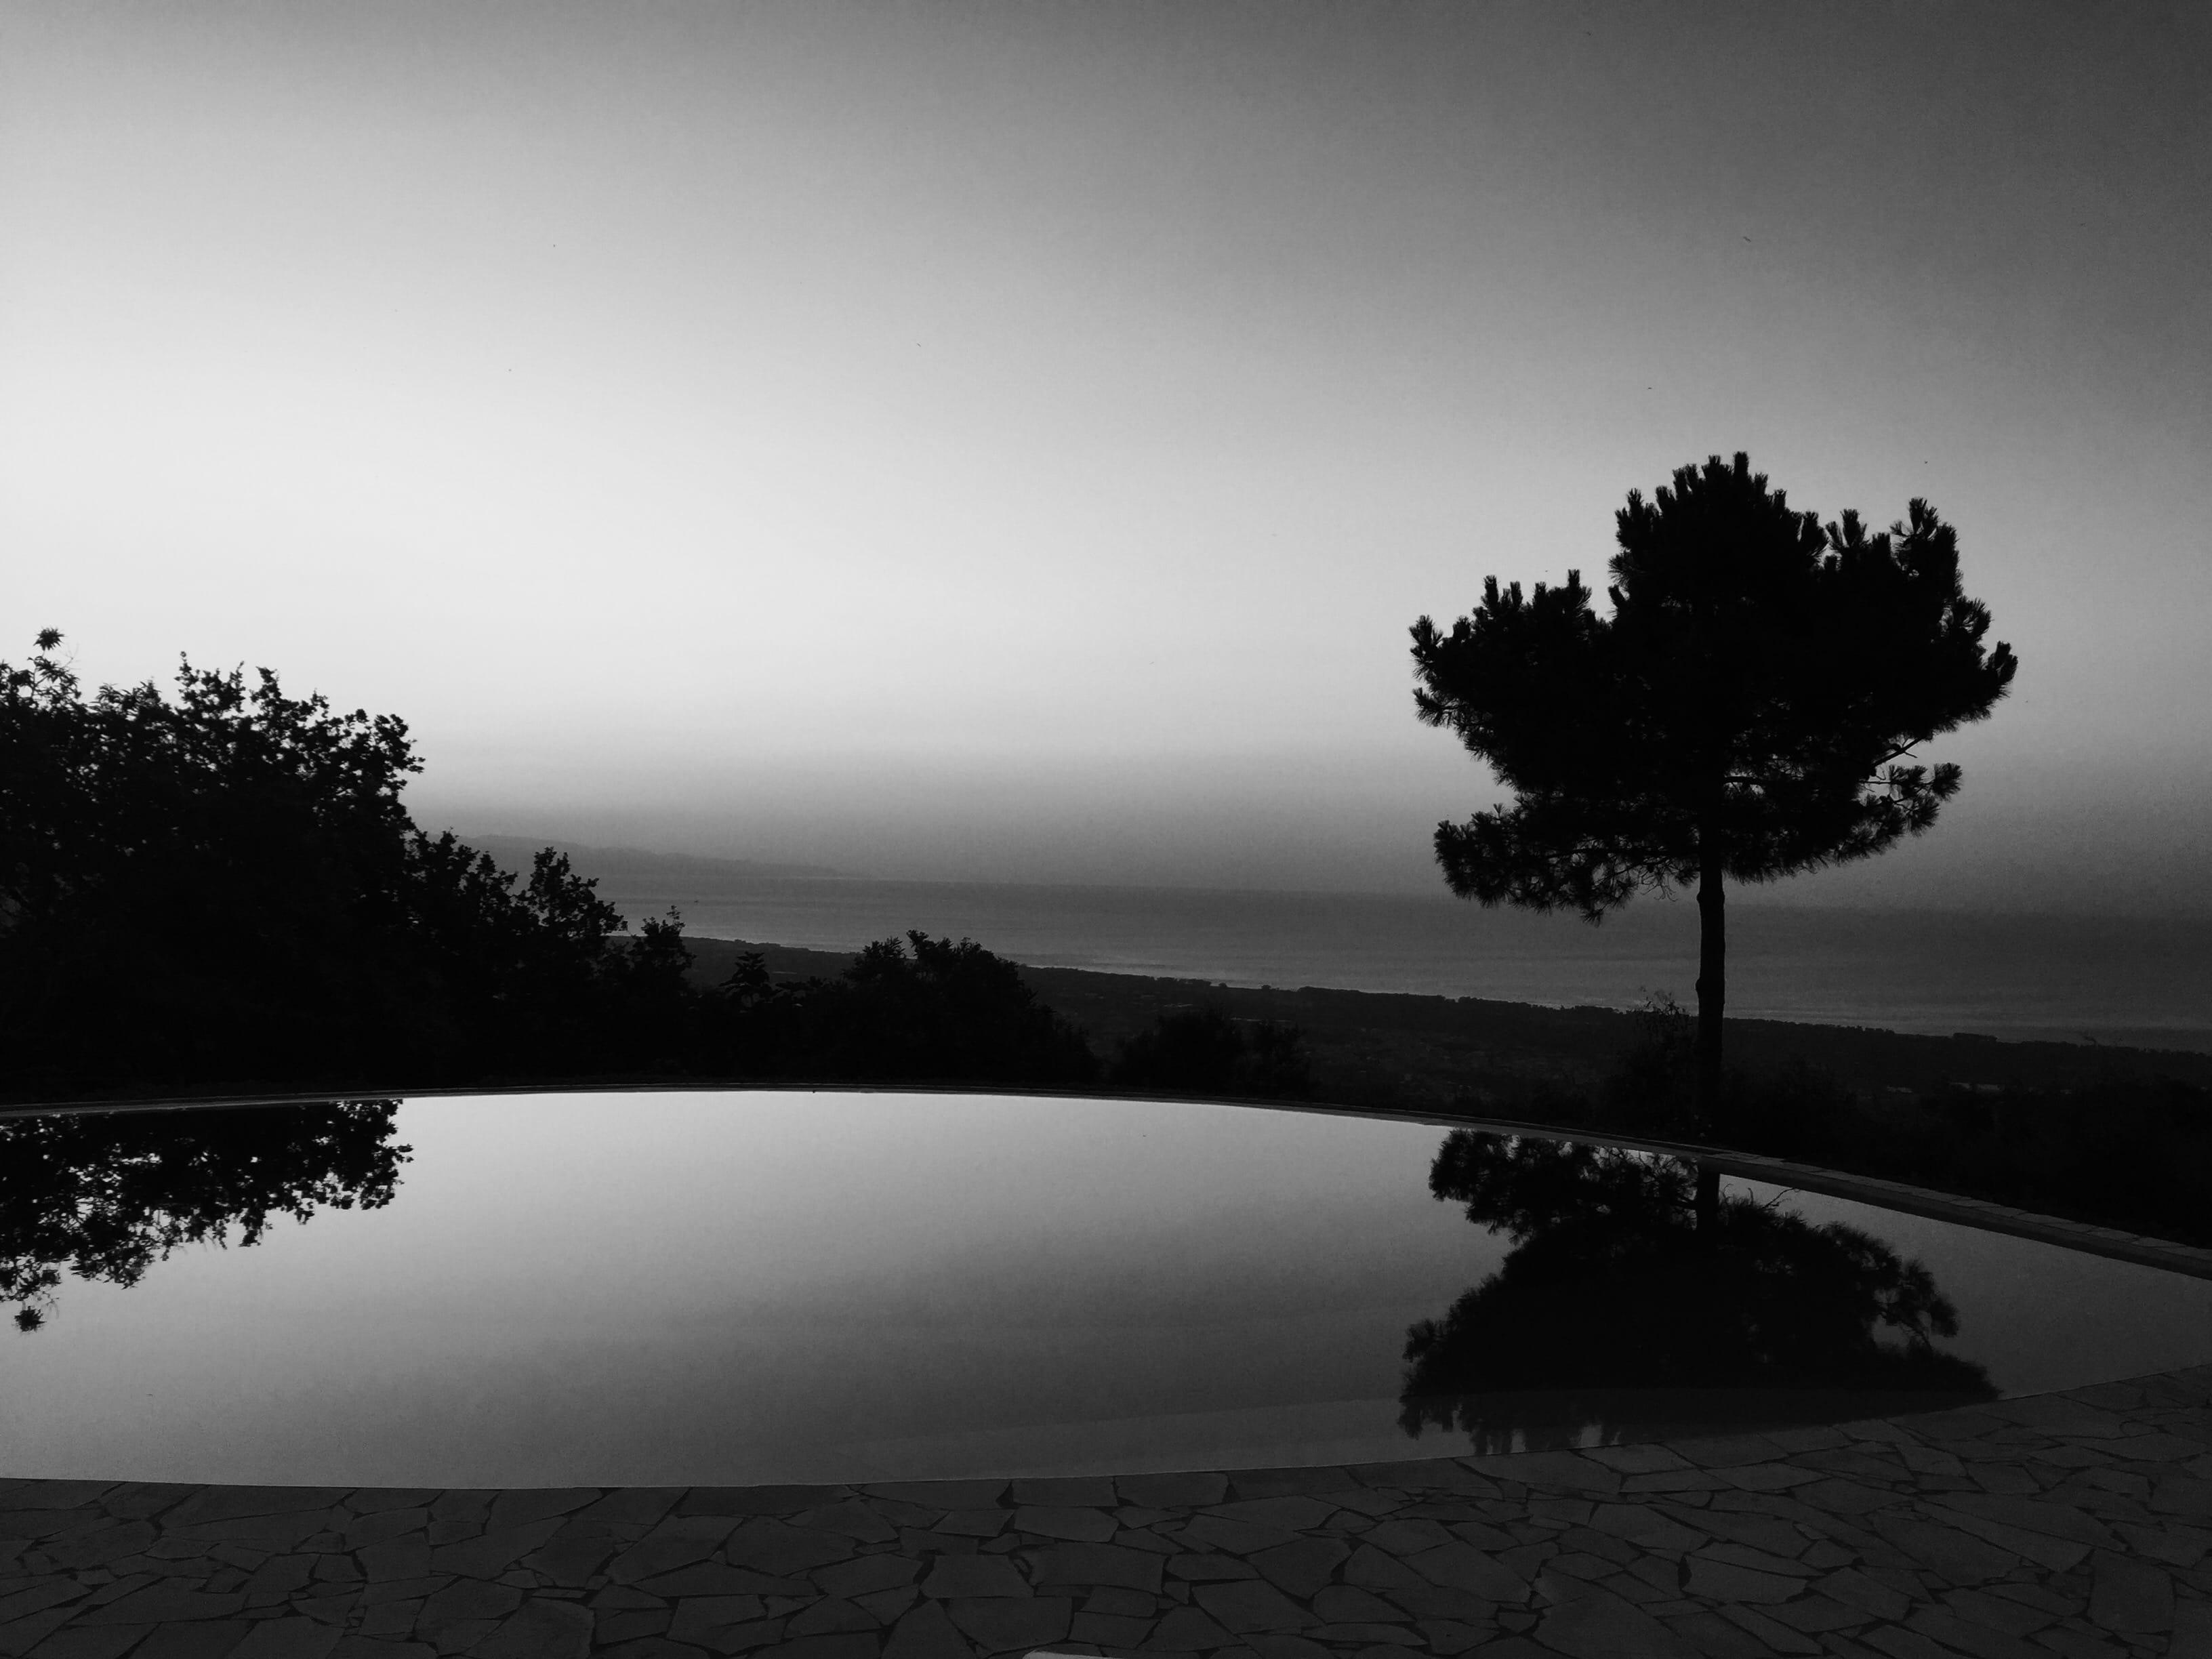 2016 Sicilia ©MatteoMigliorini